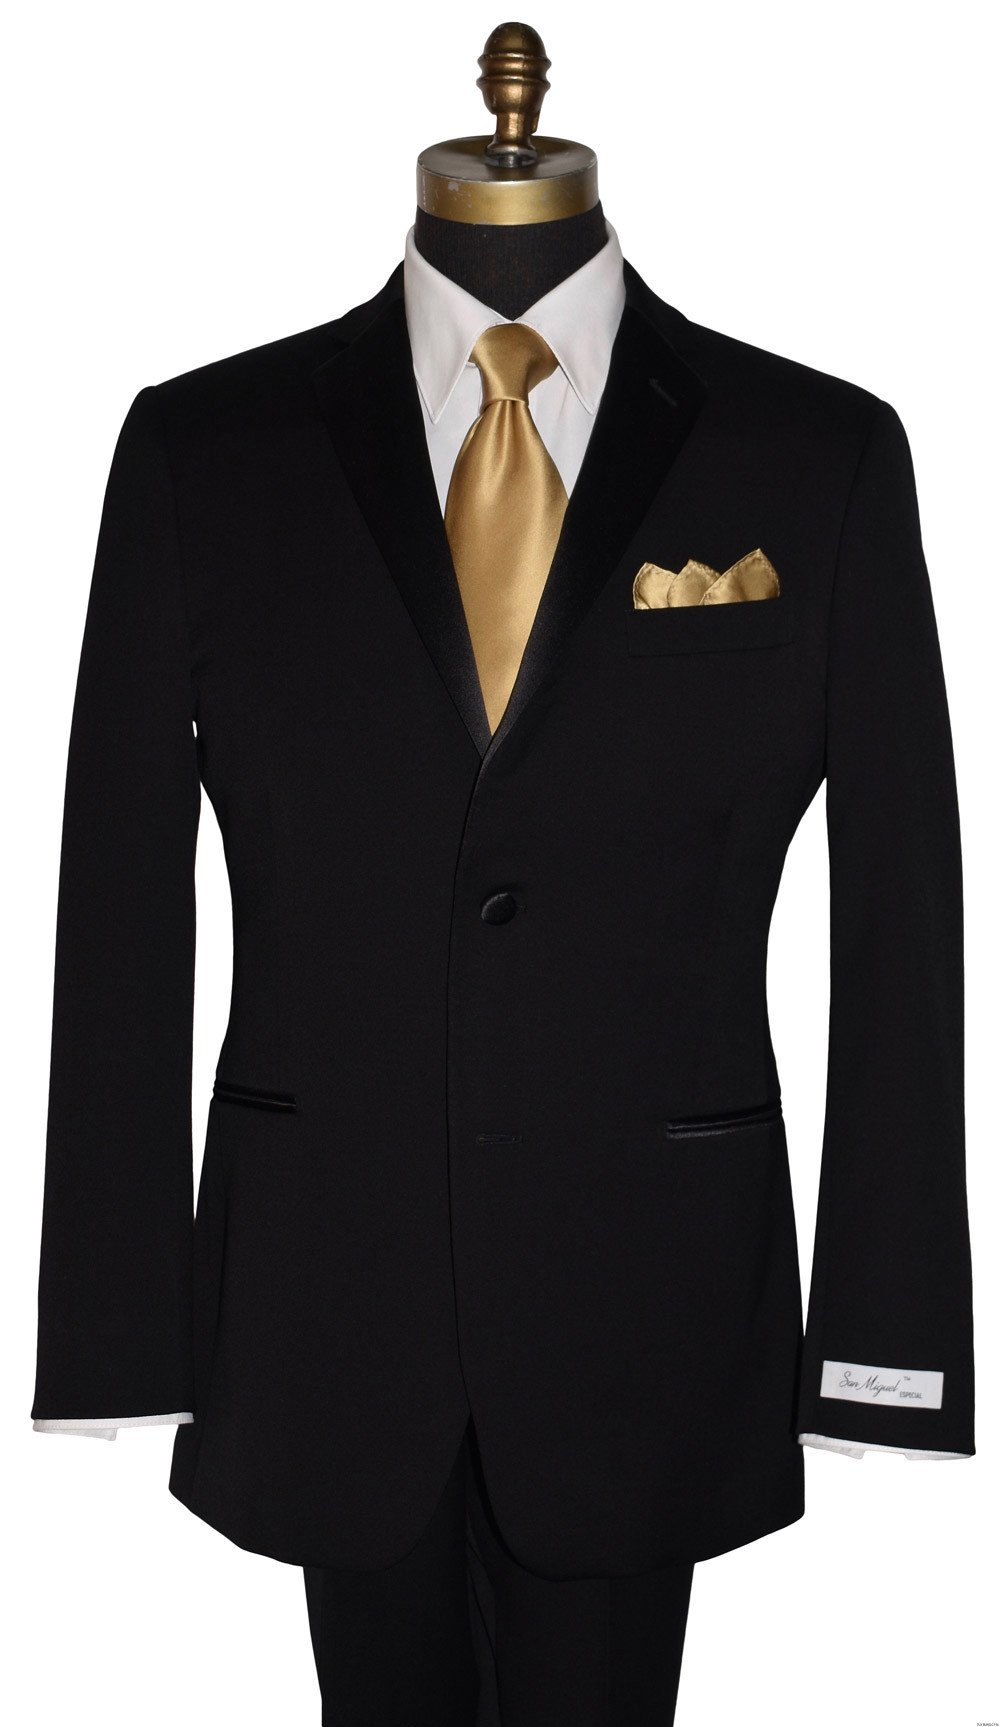 men's black tuxedo by San Miguel Formals with gold silk men's long tie